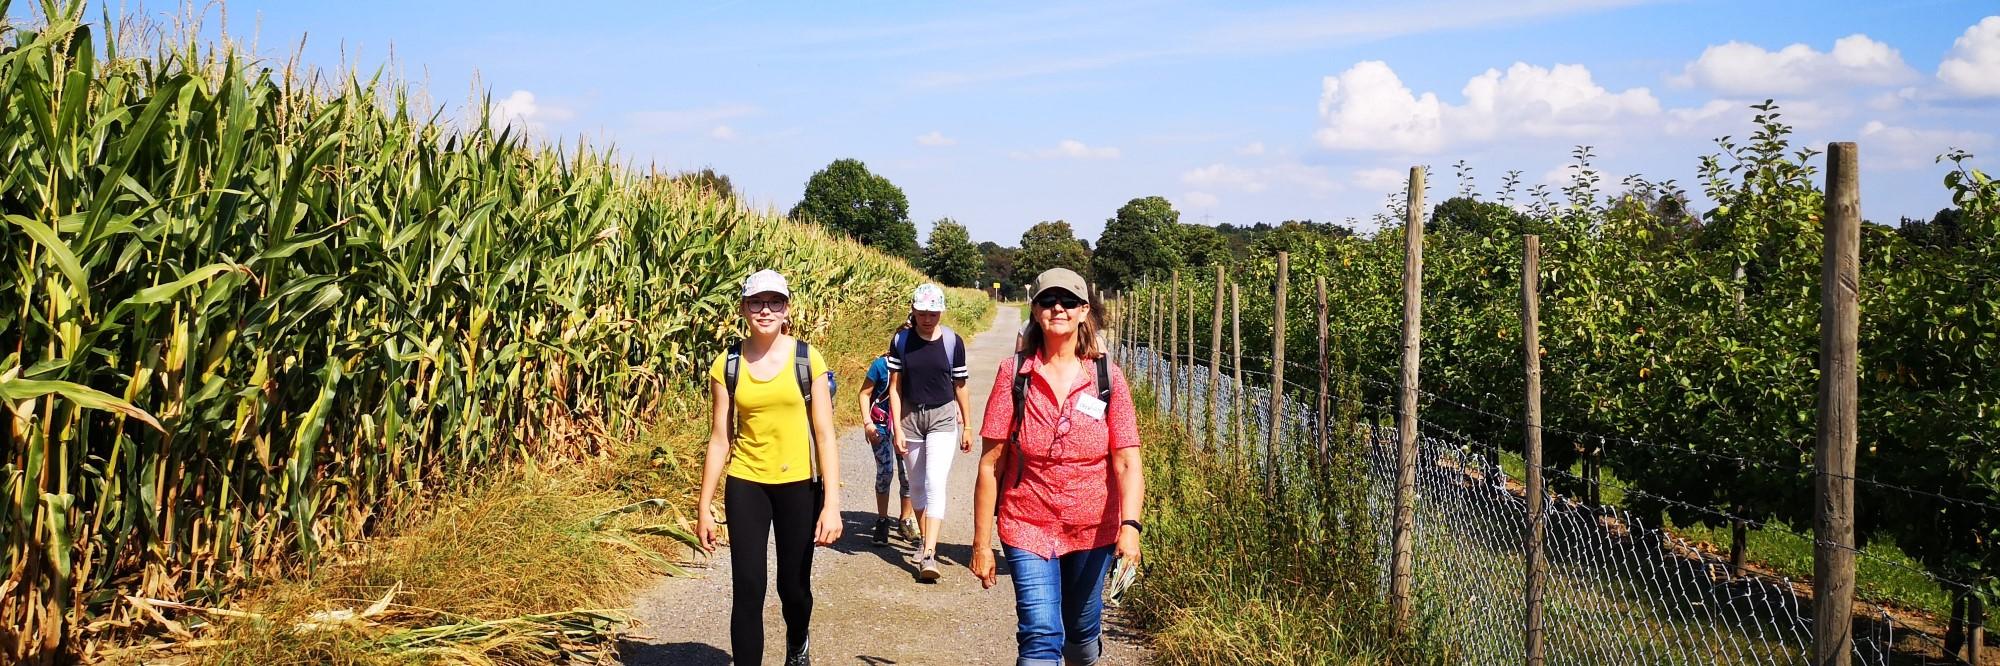 Wanderer auf einem Feldweg